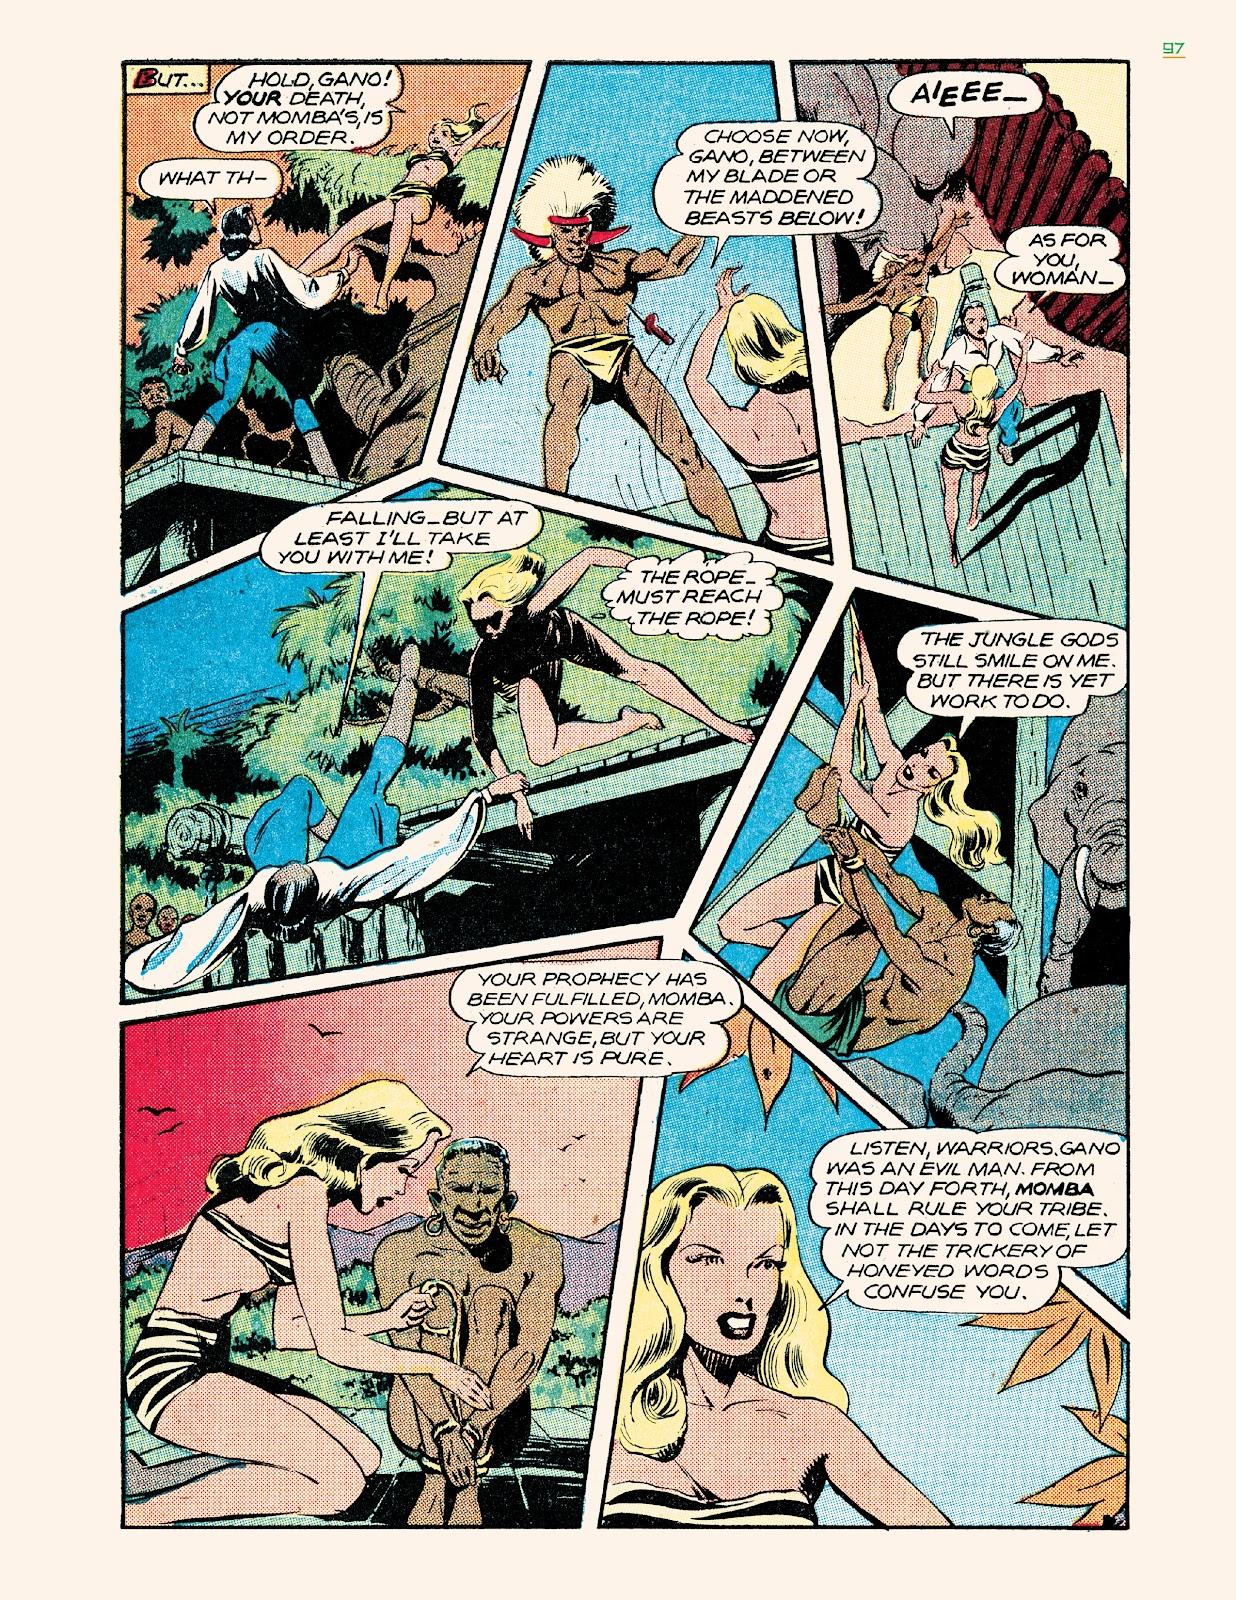 Read online Jungle Girls comic -  Issue # TPB (Part 1) - 97